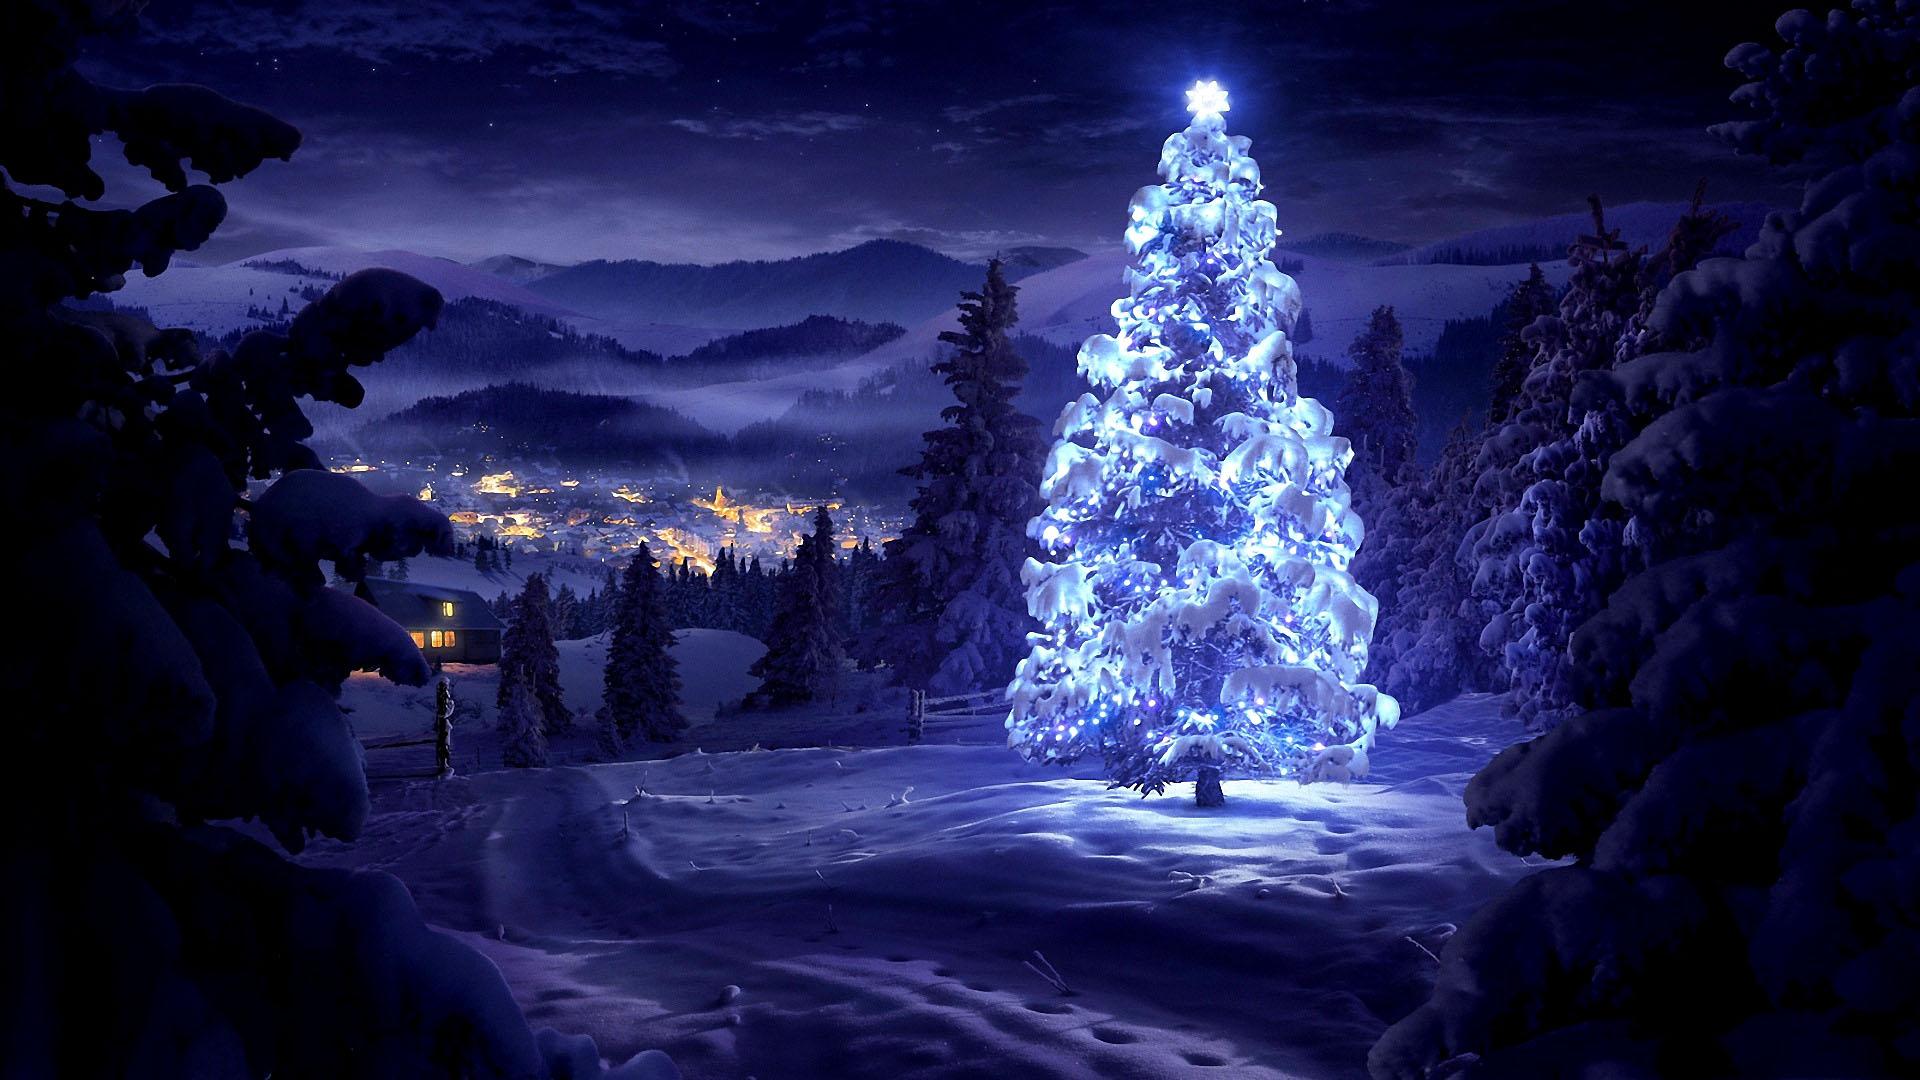 Christmas-Tree-1920-1080-via-Classy-Bro-wallpaper-wpc9003552